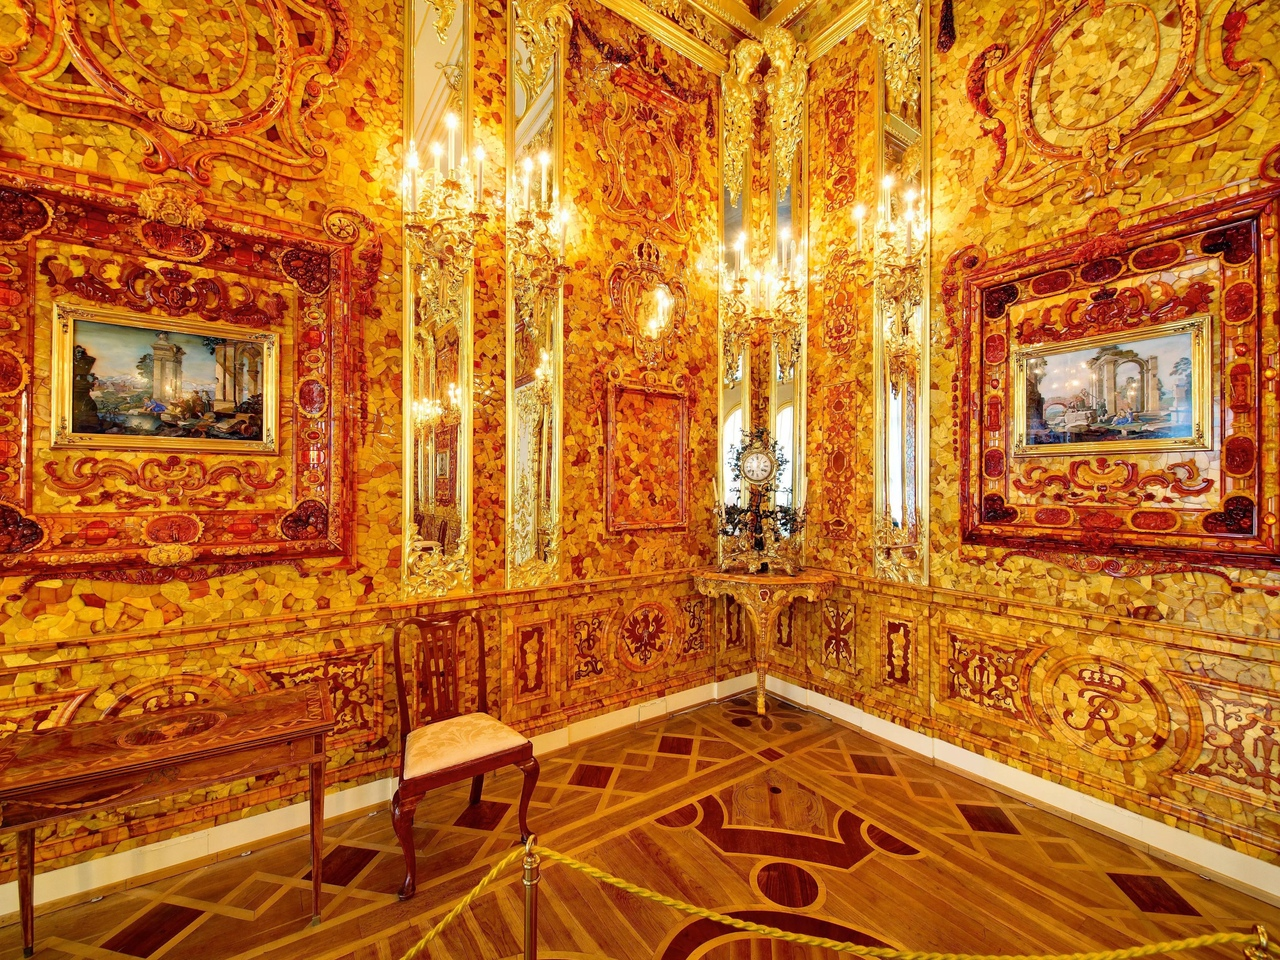 Картинки с янтарной комнатой